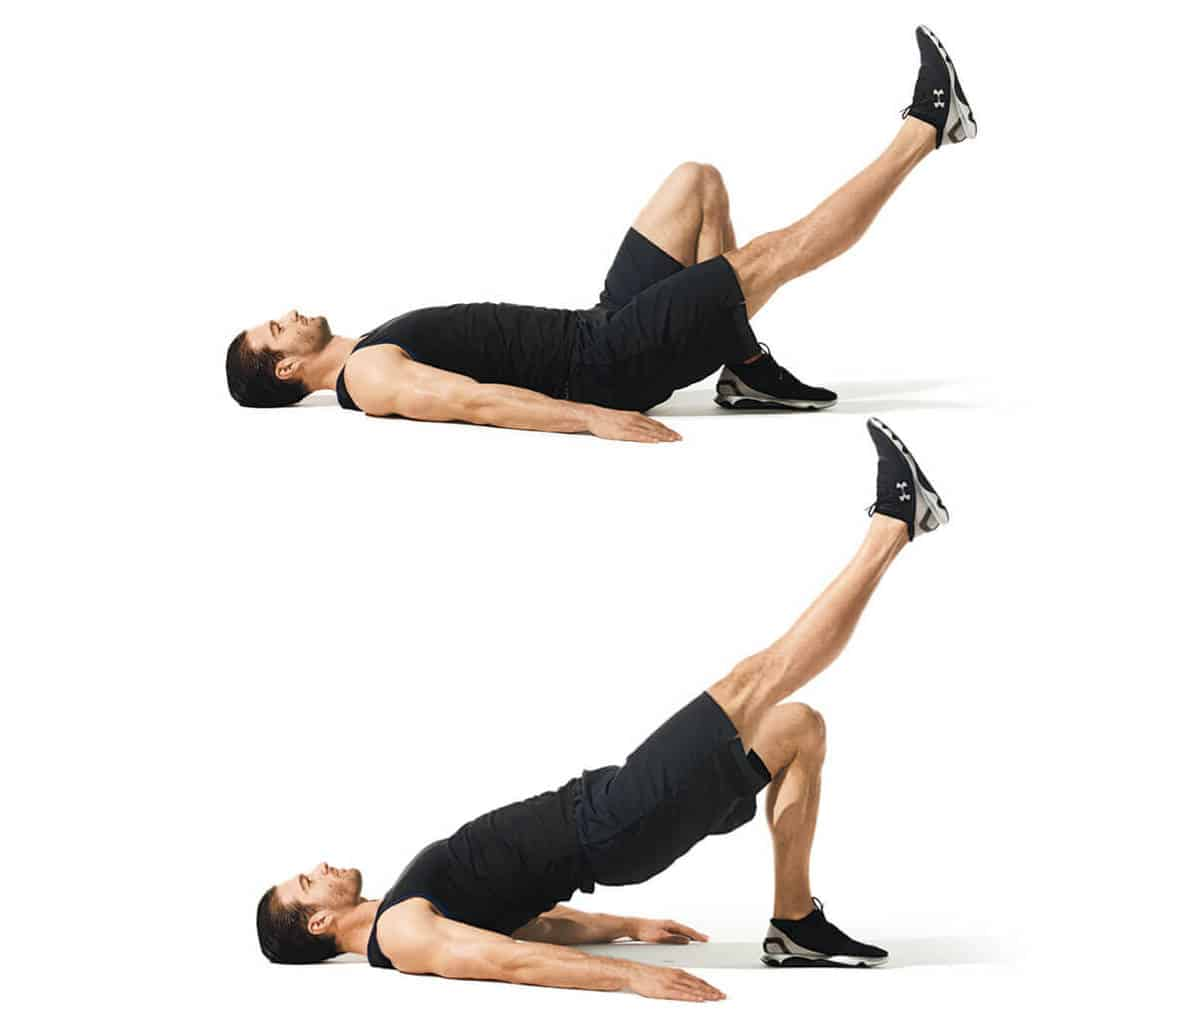 Single Leg Hip Extension